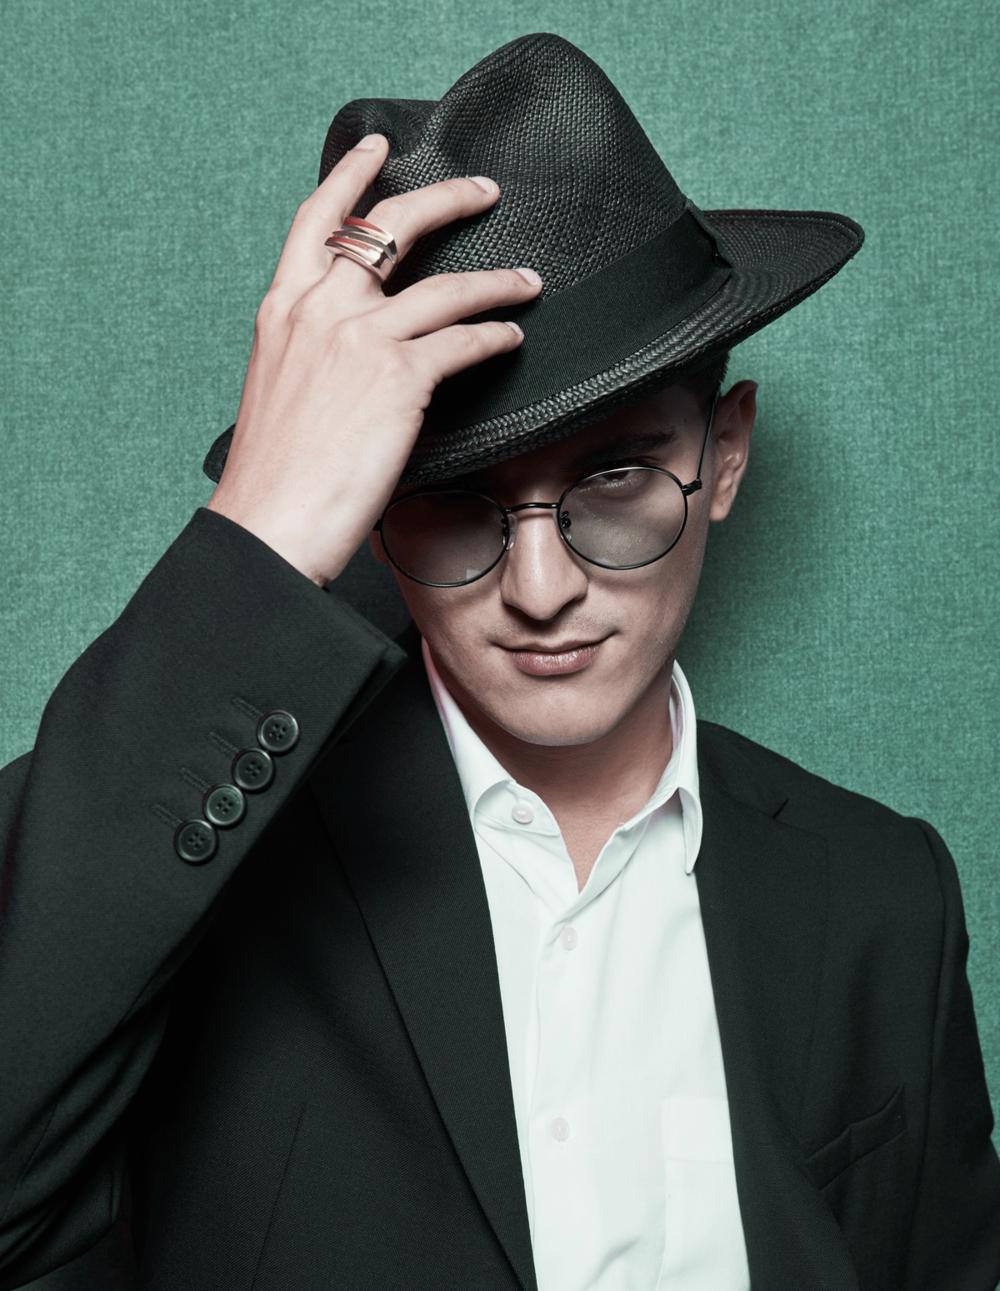 clothes : GIVENCHY / sunglasses : GLAZZIQ / hat : Famosa_Andina